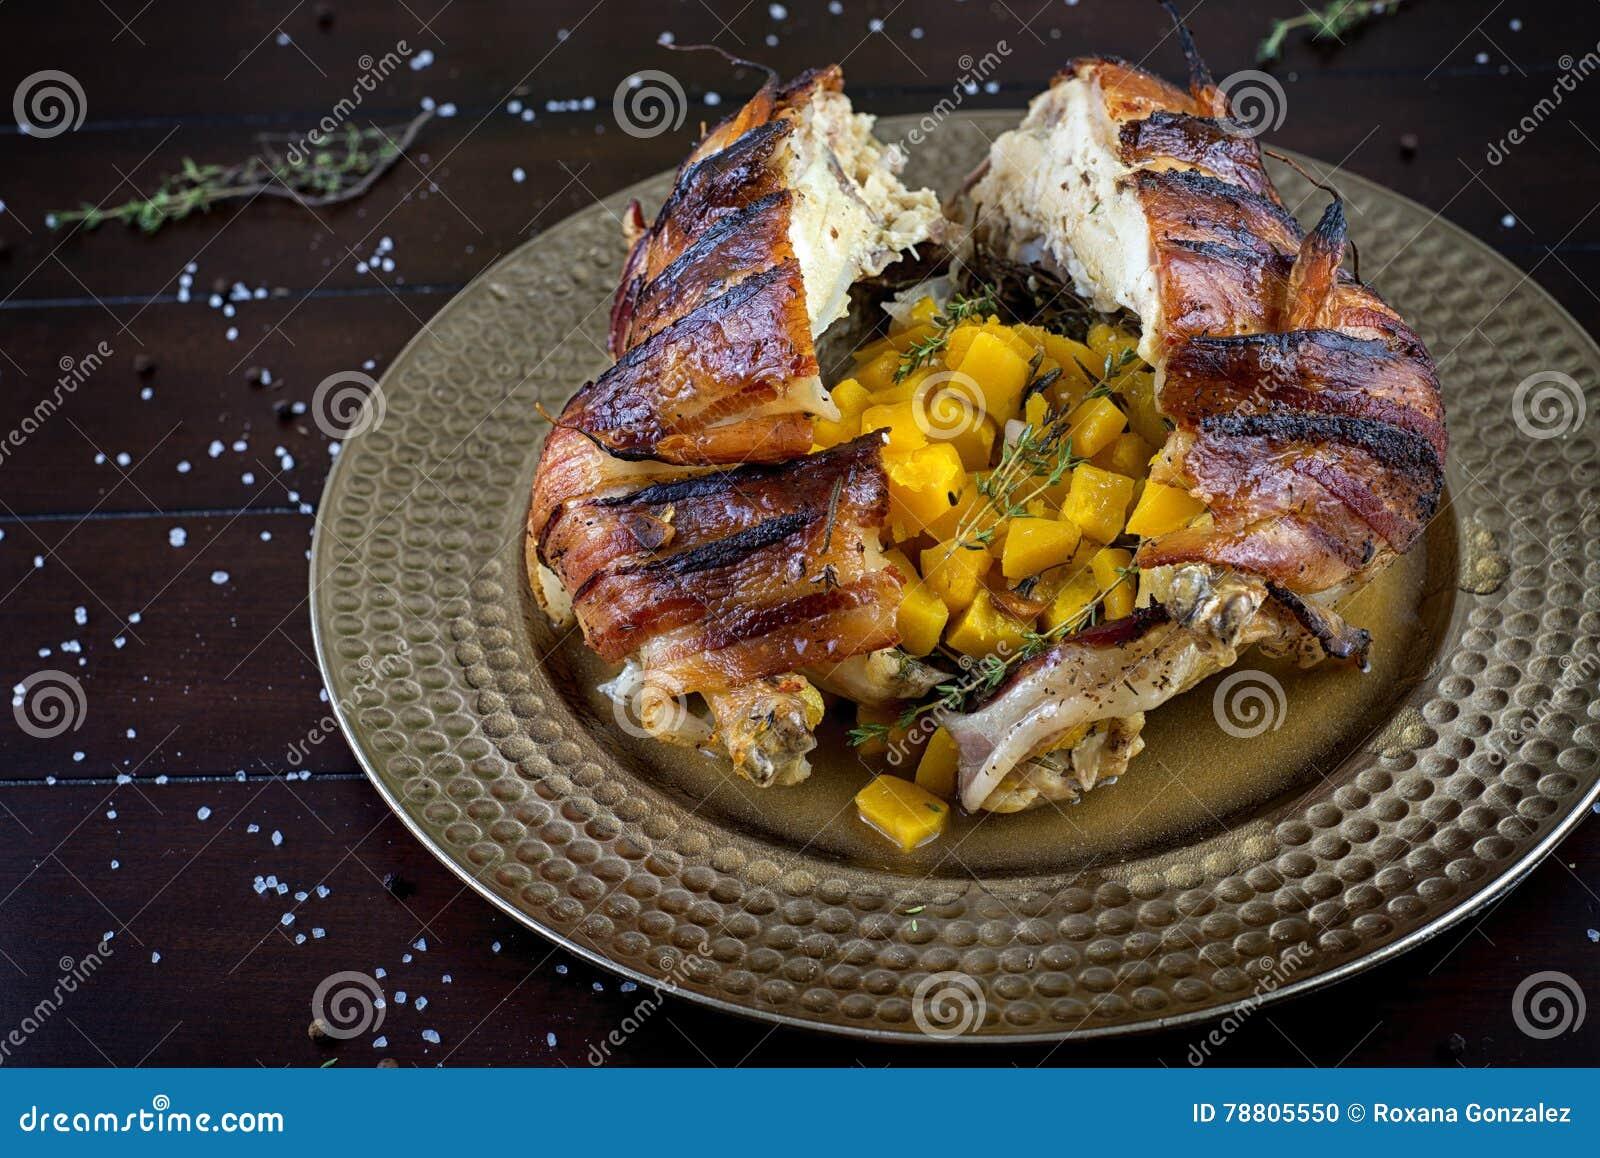 Galinha roasted envolvida bacon enchida com polpa de butternut